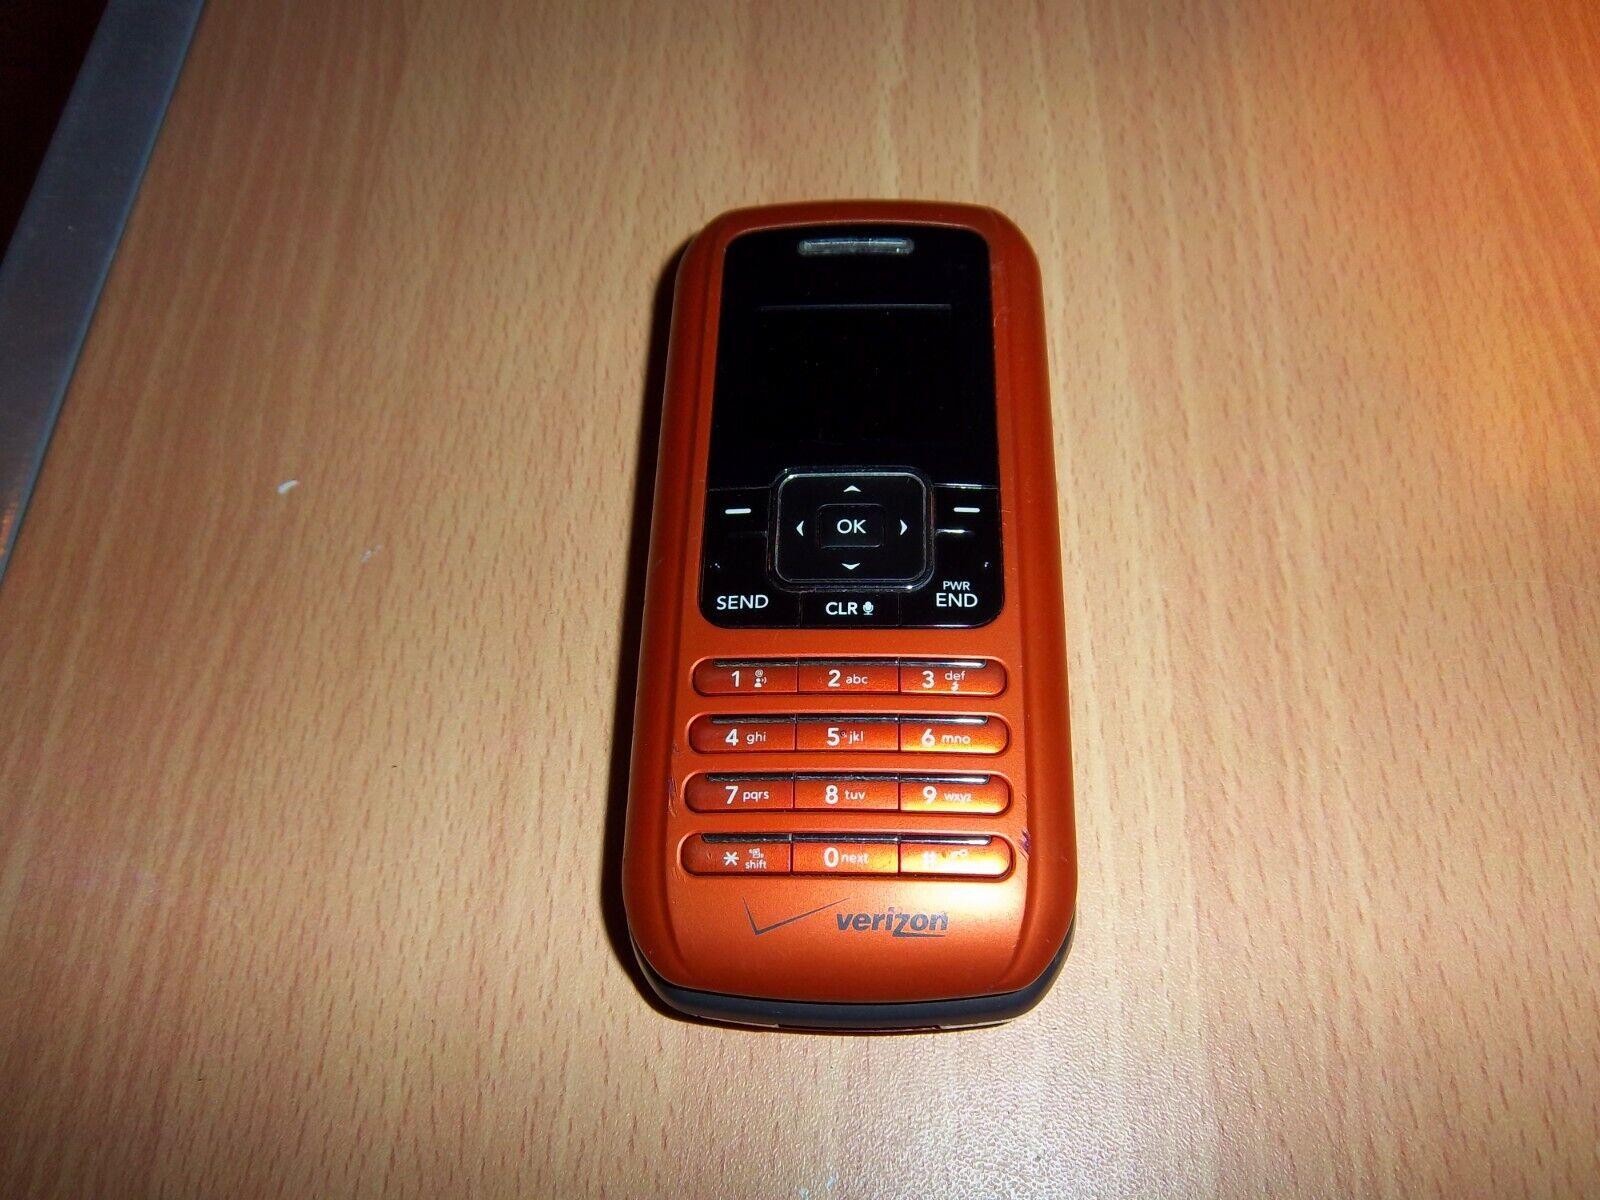 LG EnV VX9900 CELL PHONE, Special Color, Orange, Keyboard untested  - $4.99